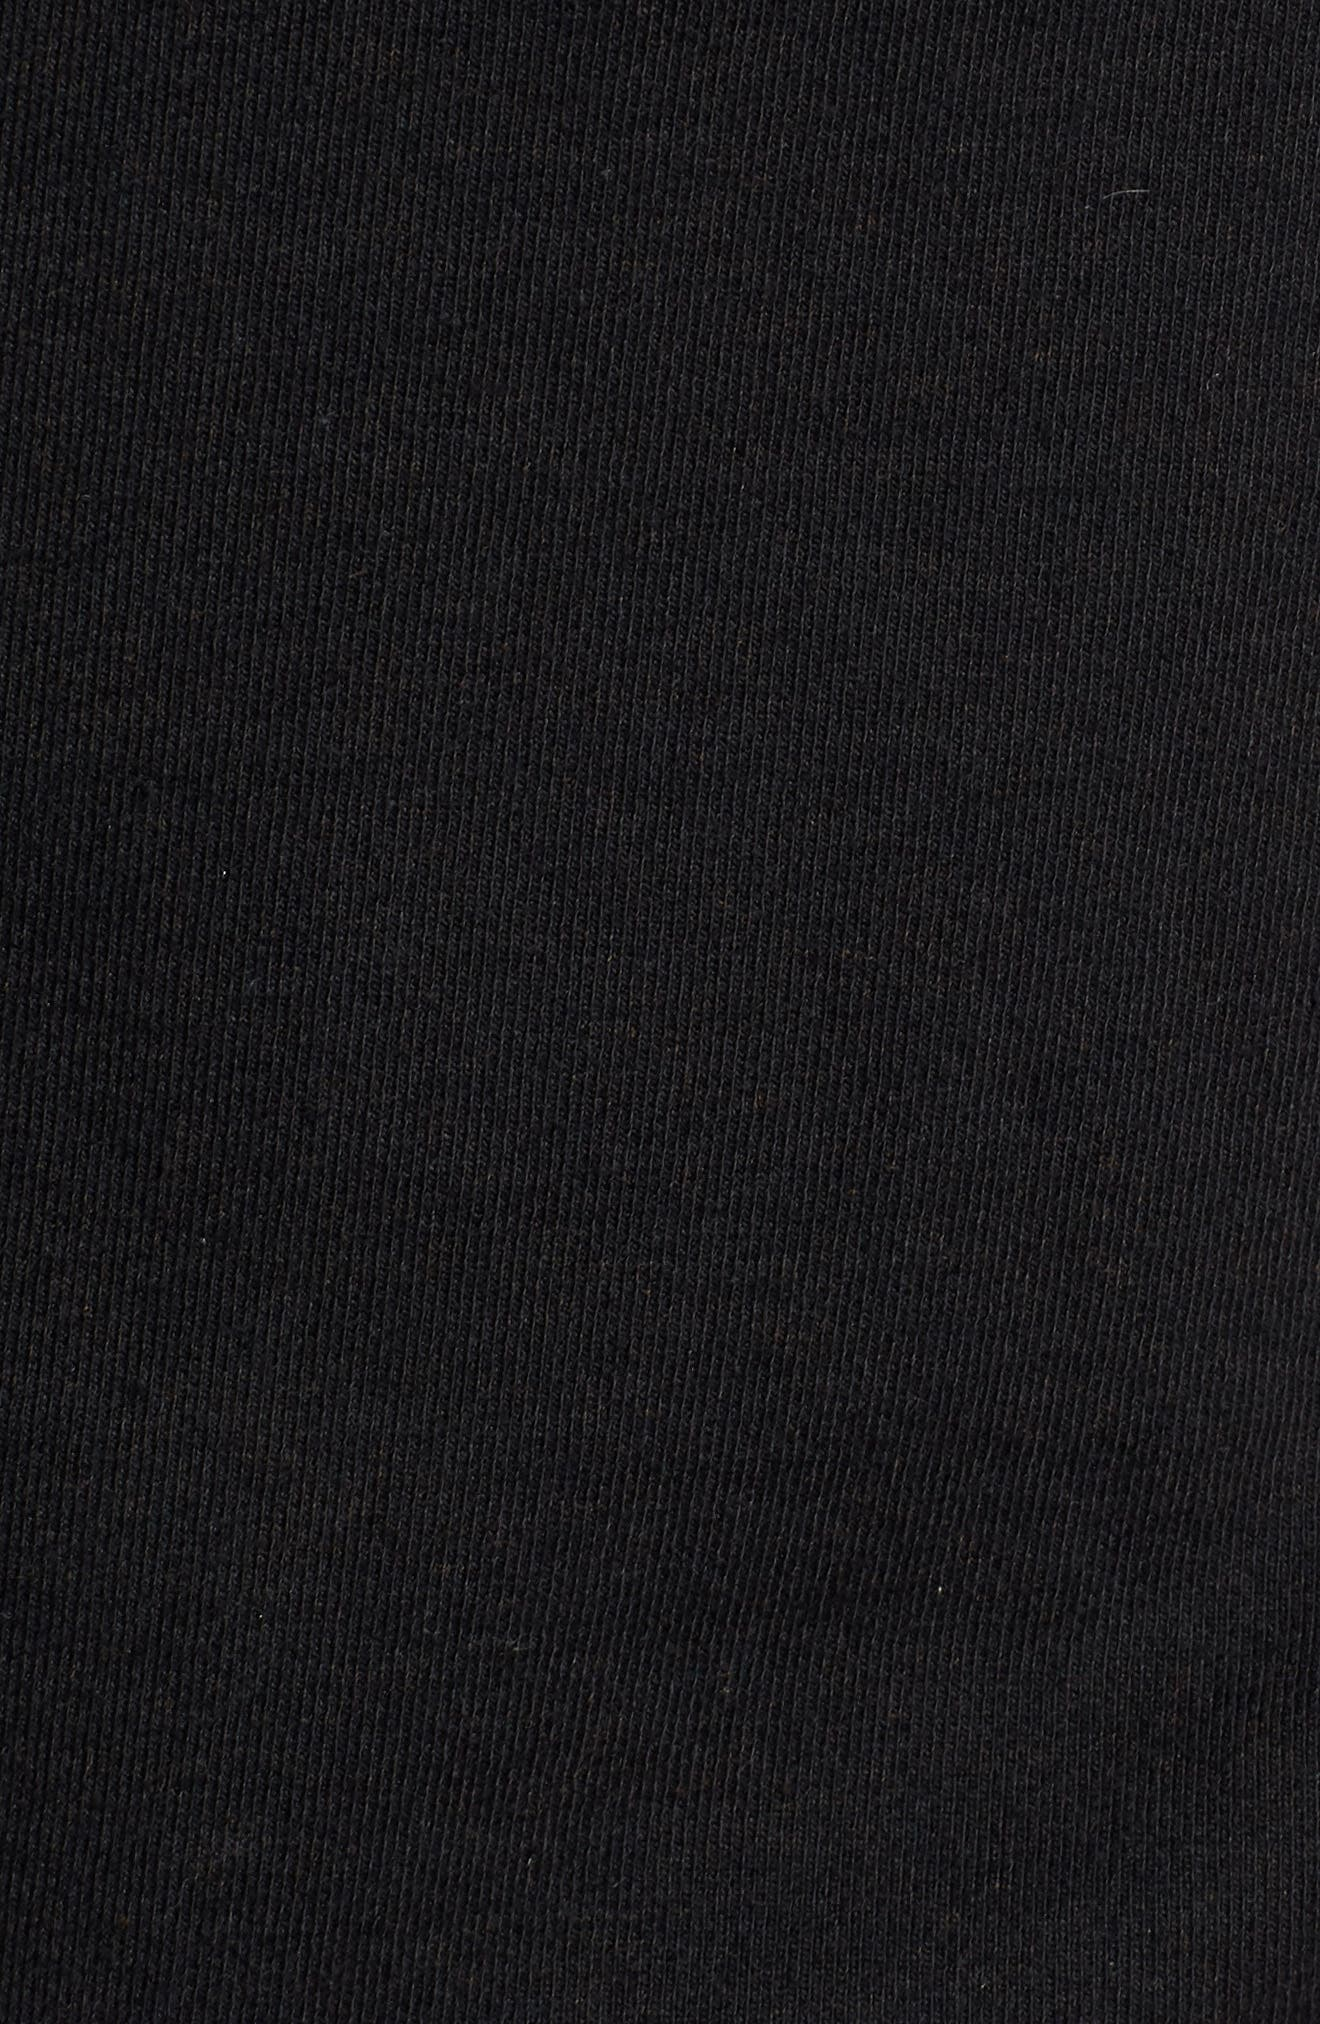 PATAGONIA, P6 Logo Uprisal Hooded Sweatshirt, Alternate thumbnail 5, color, BLACK